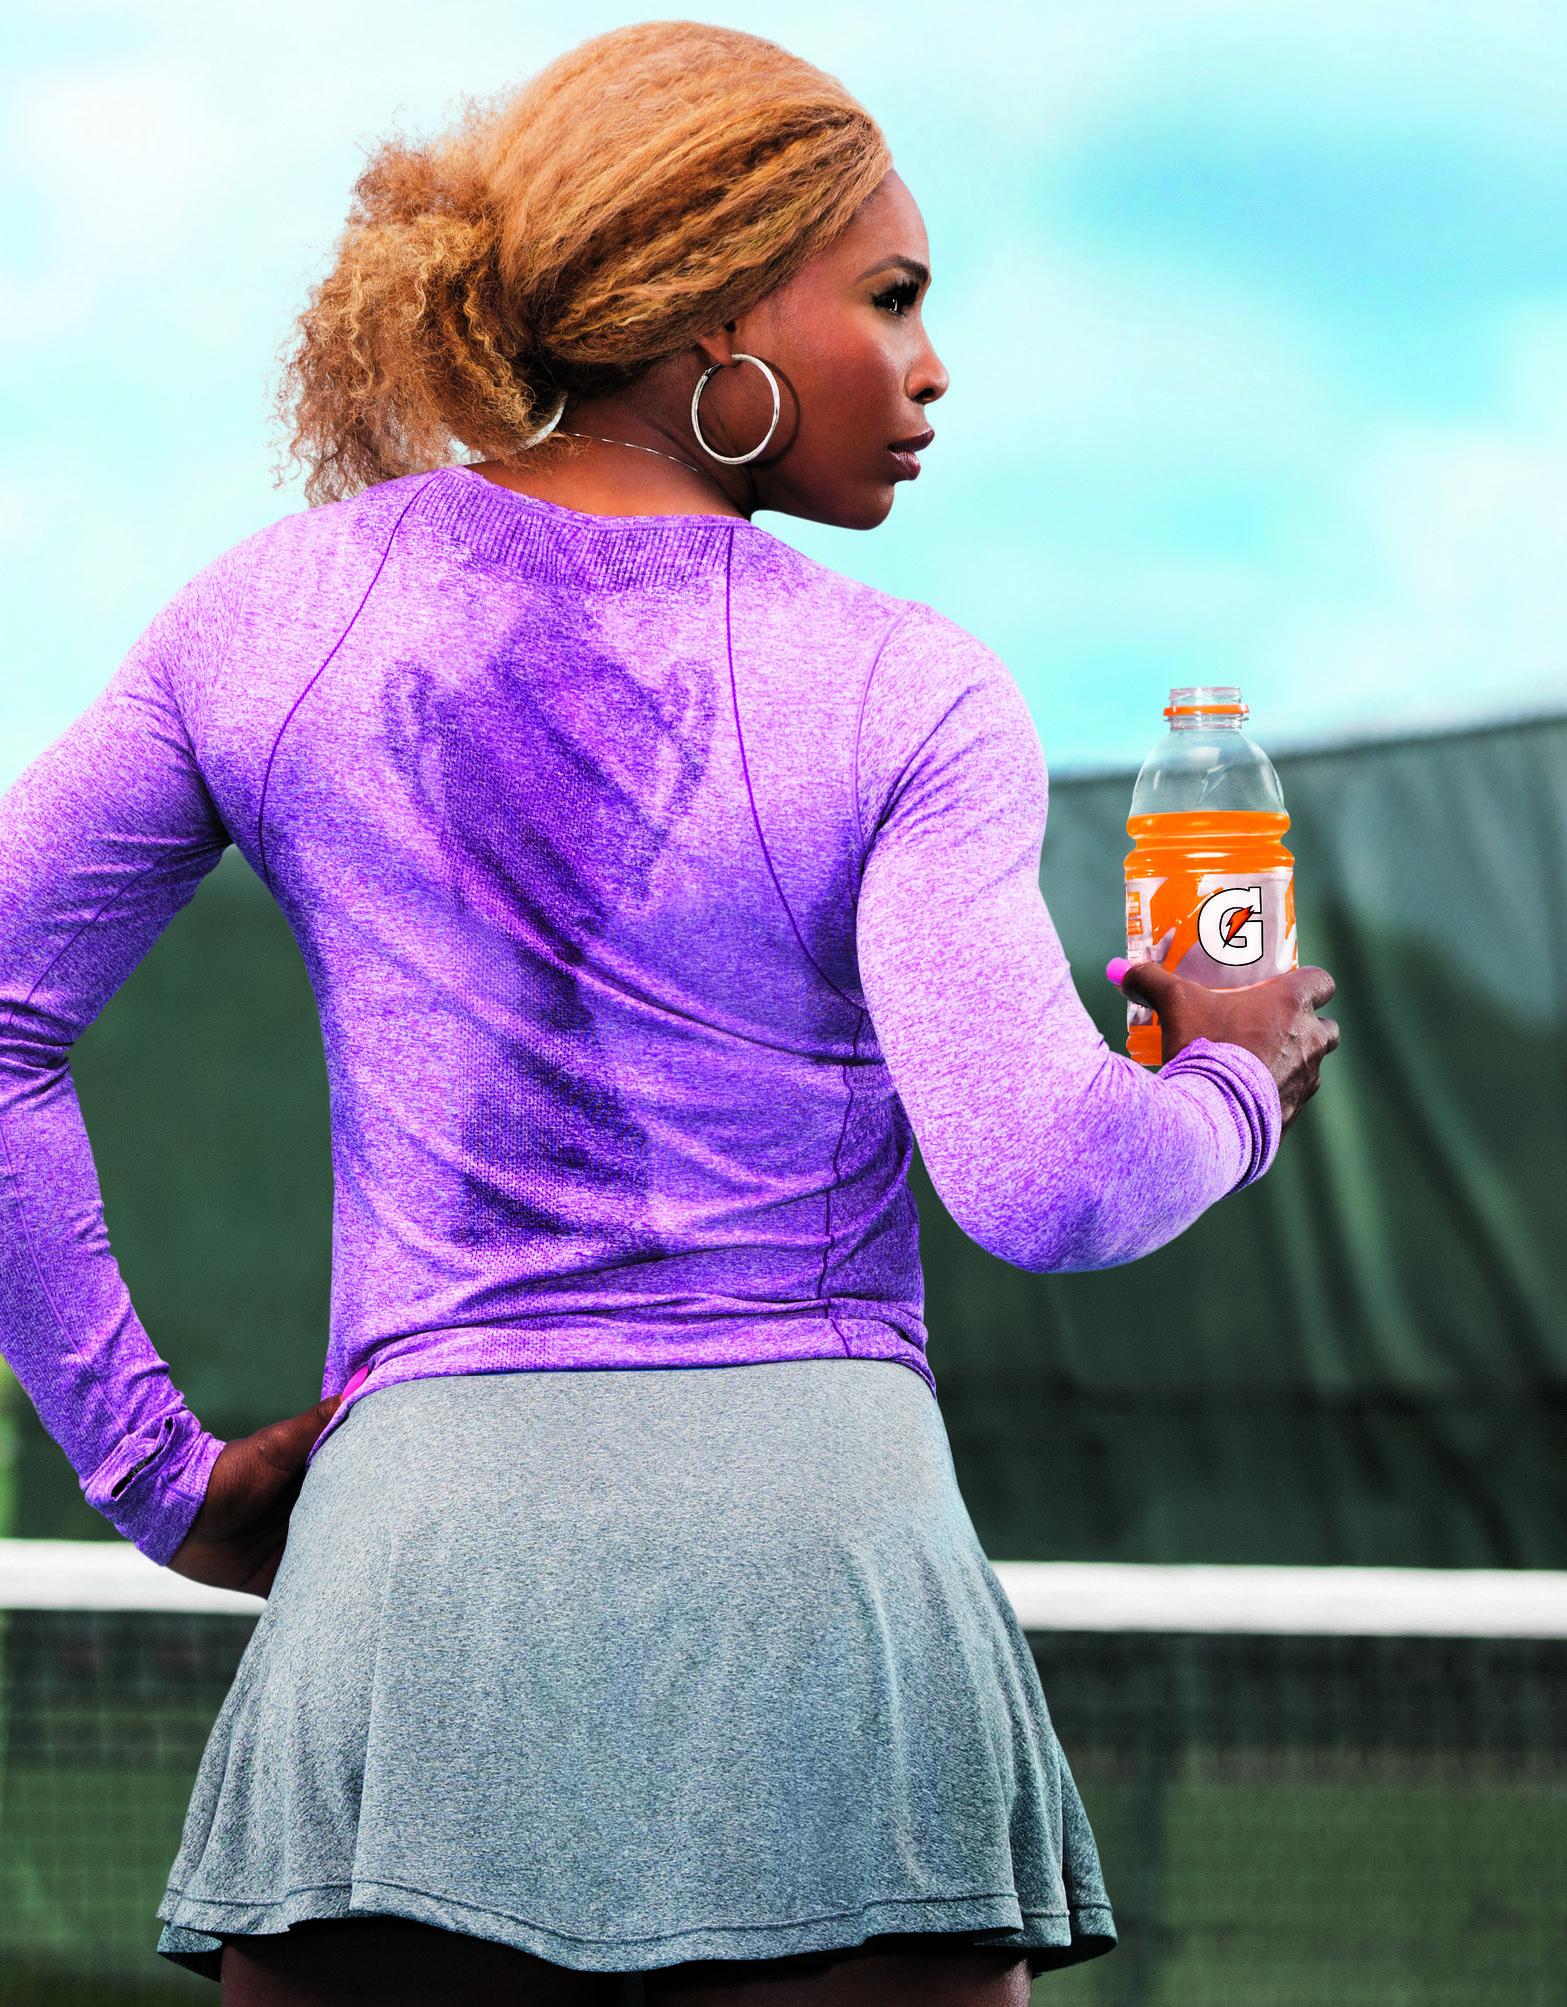 Gatorade Ad shot by Gary Land